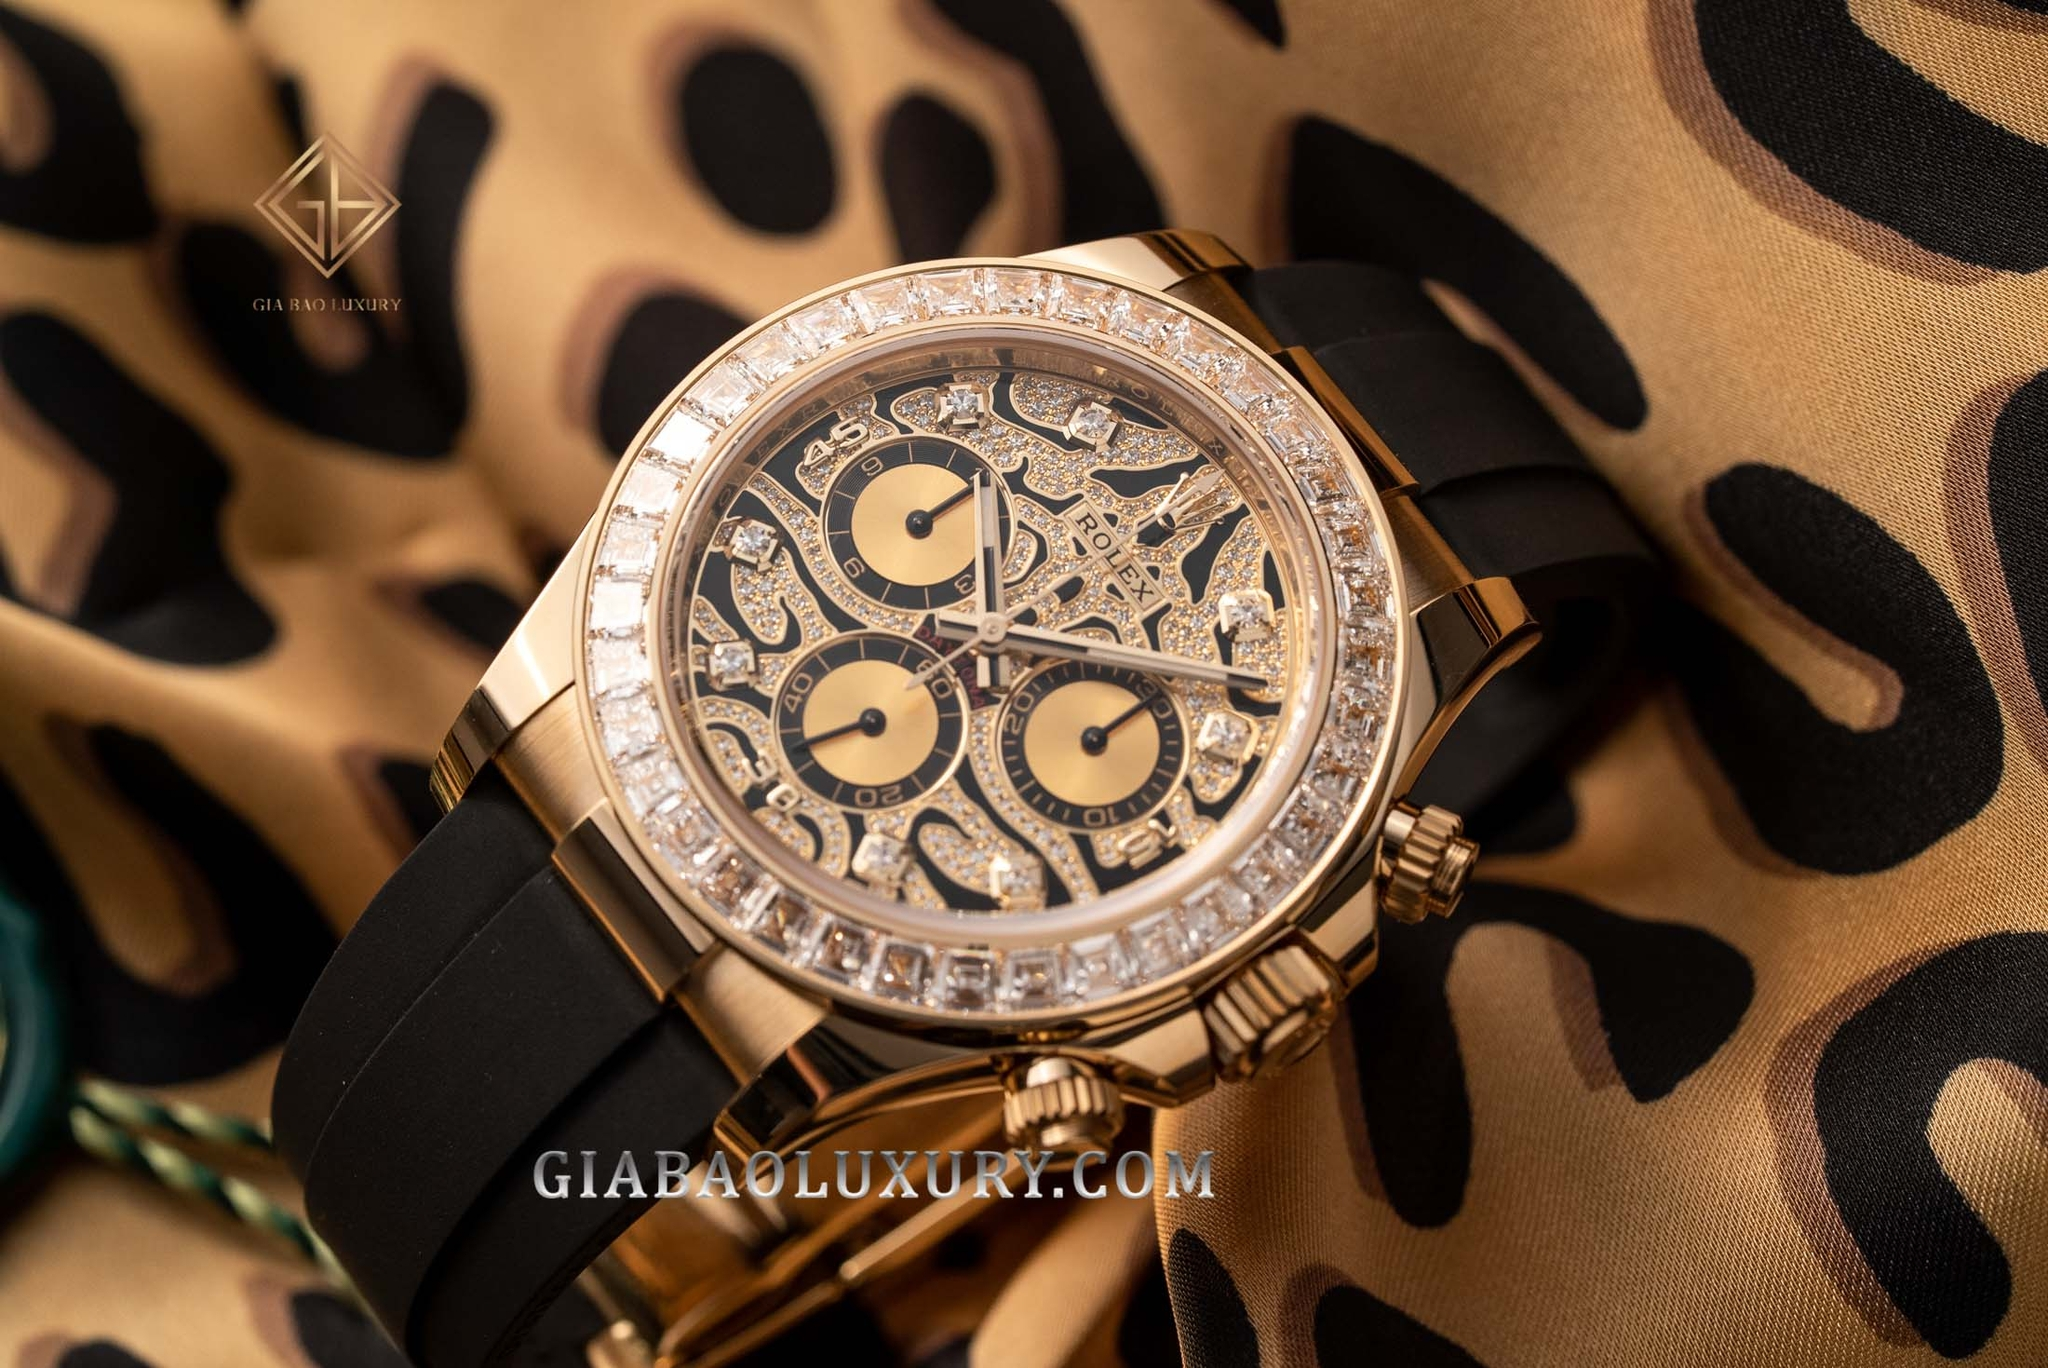 Đồng Hồ Rolex Cosmograph Daytona 116588TBR Eye Of Tiger